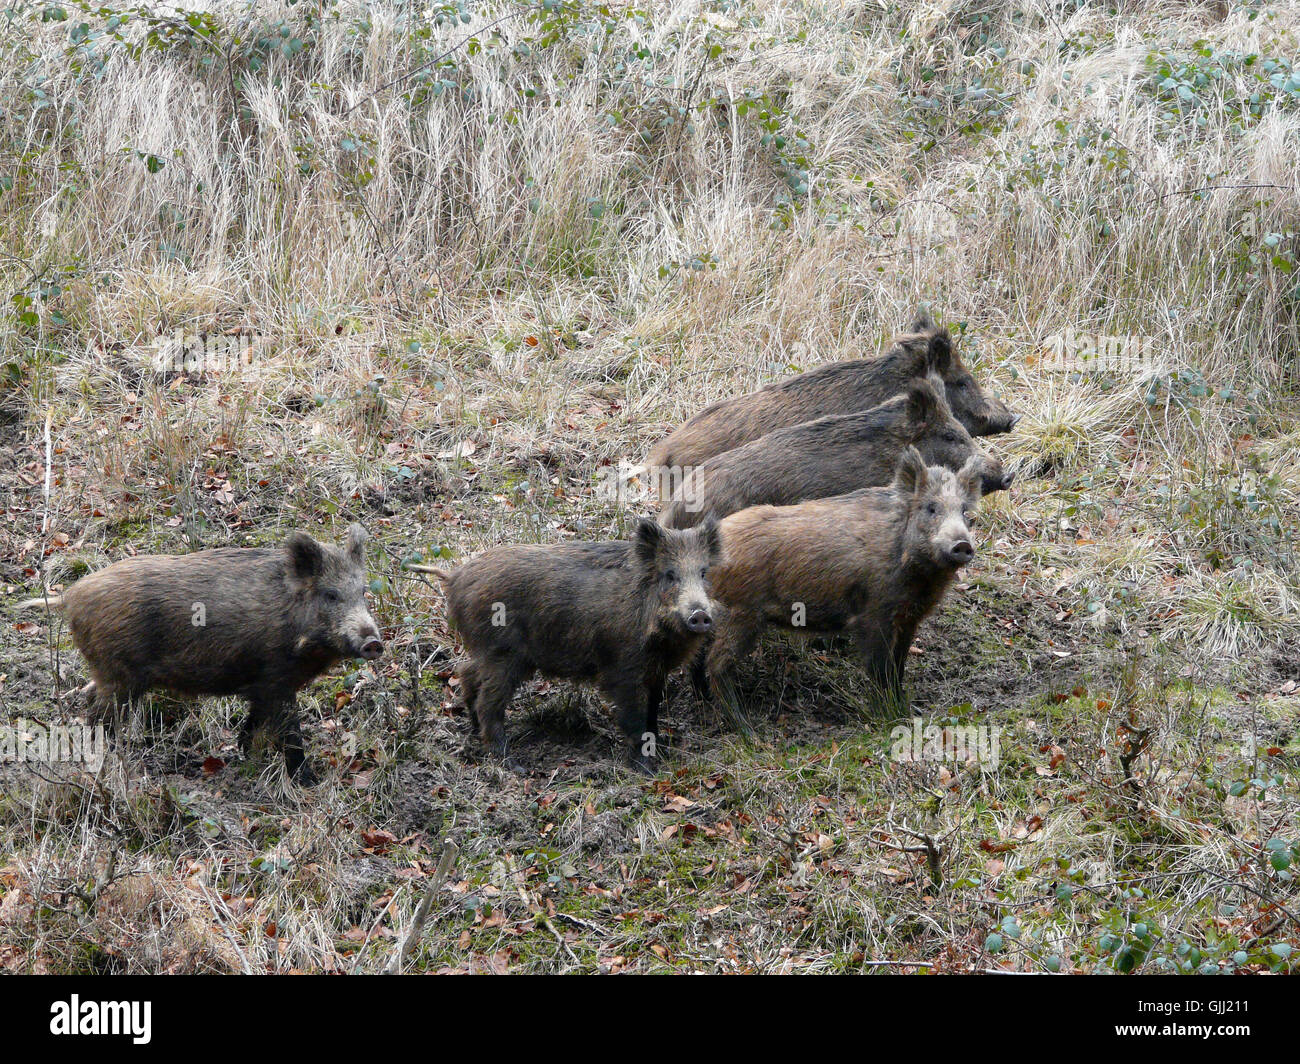 wildlife wild boars boars - Stock Image